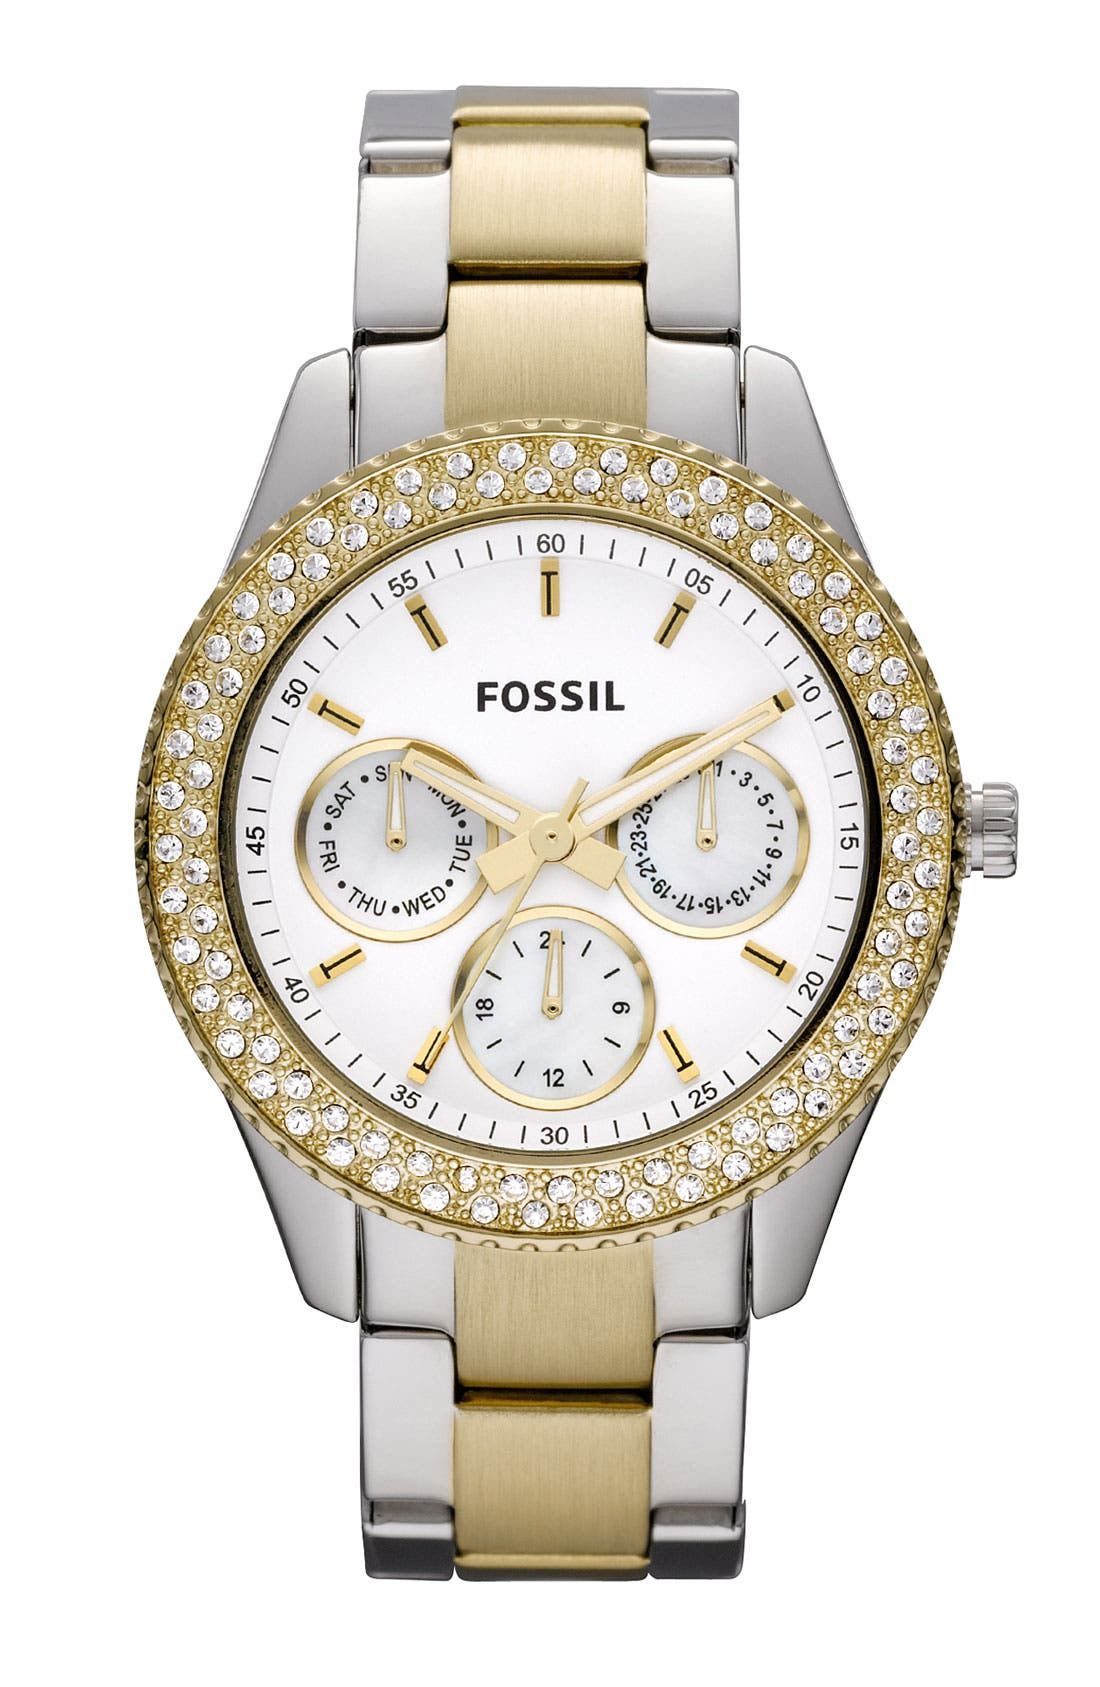 Main Image - Fossil Multifunction Crystal Bezel Watch, 37mm